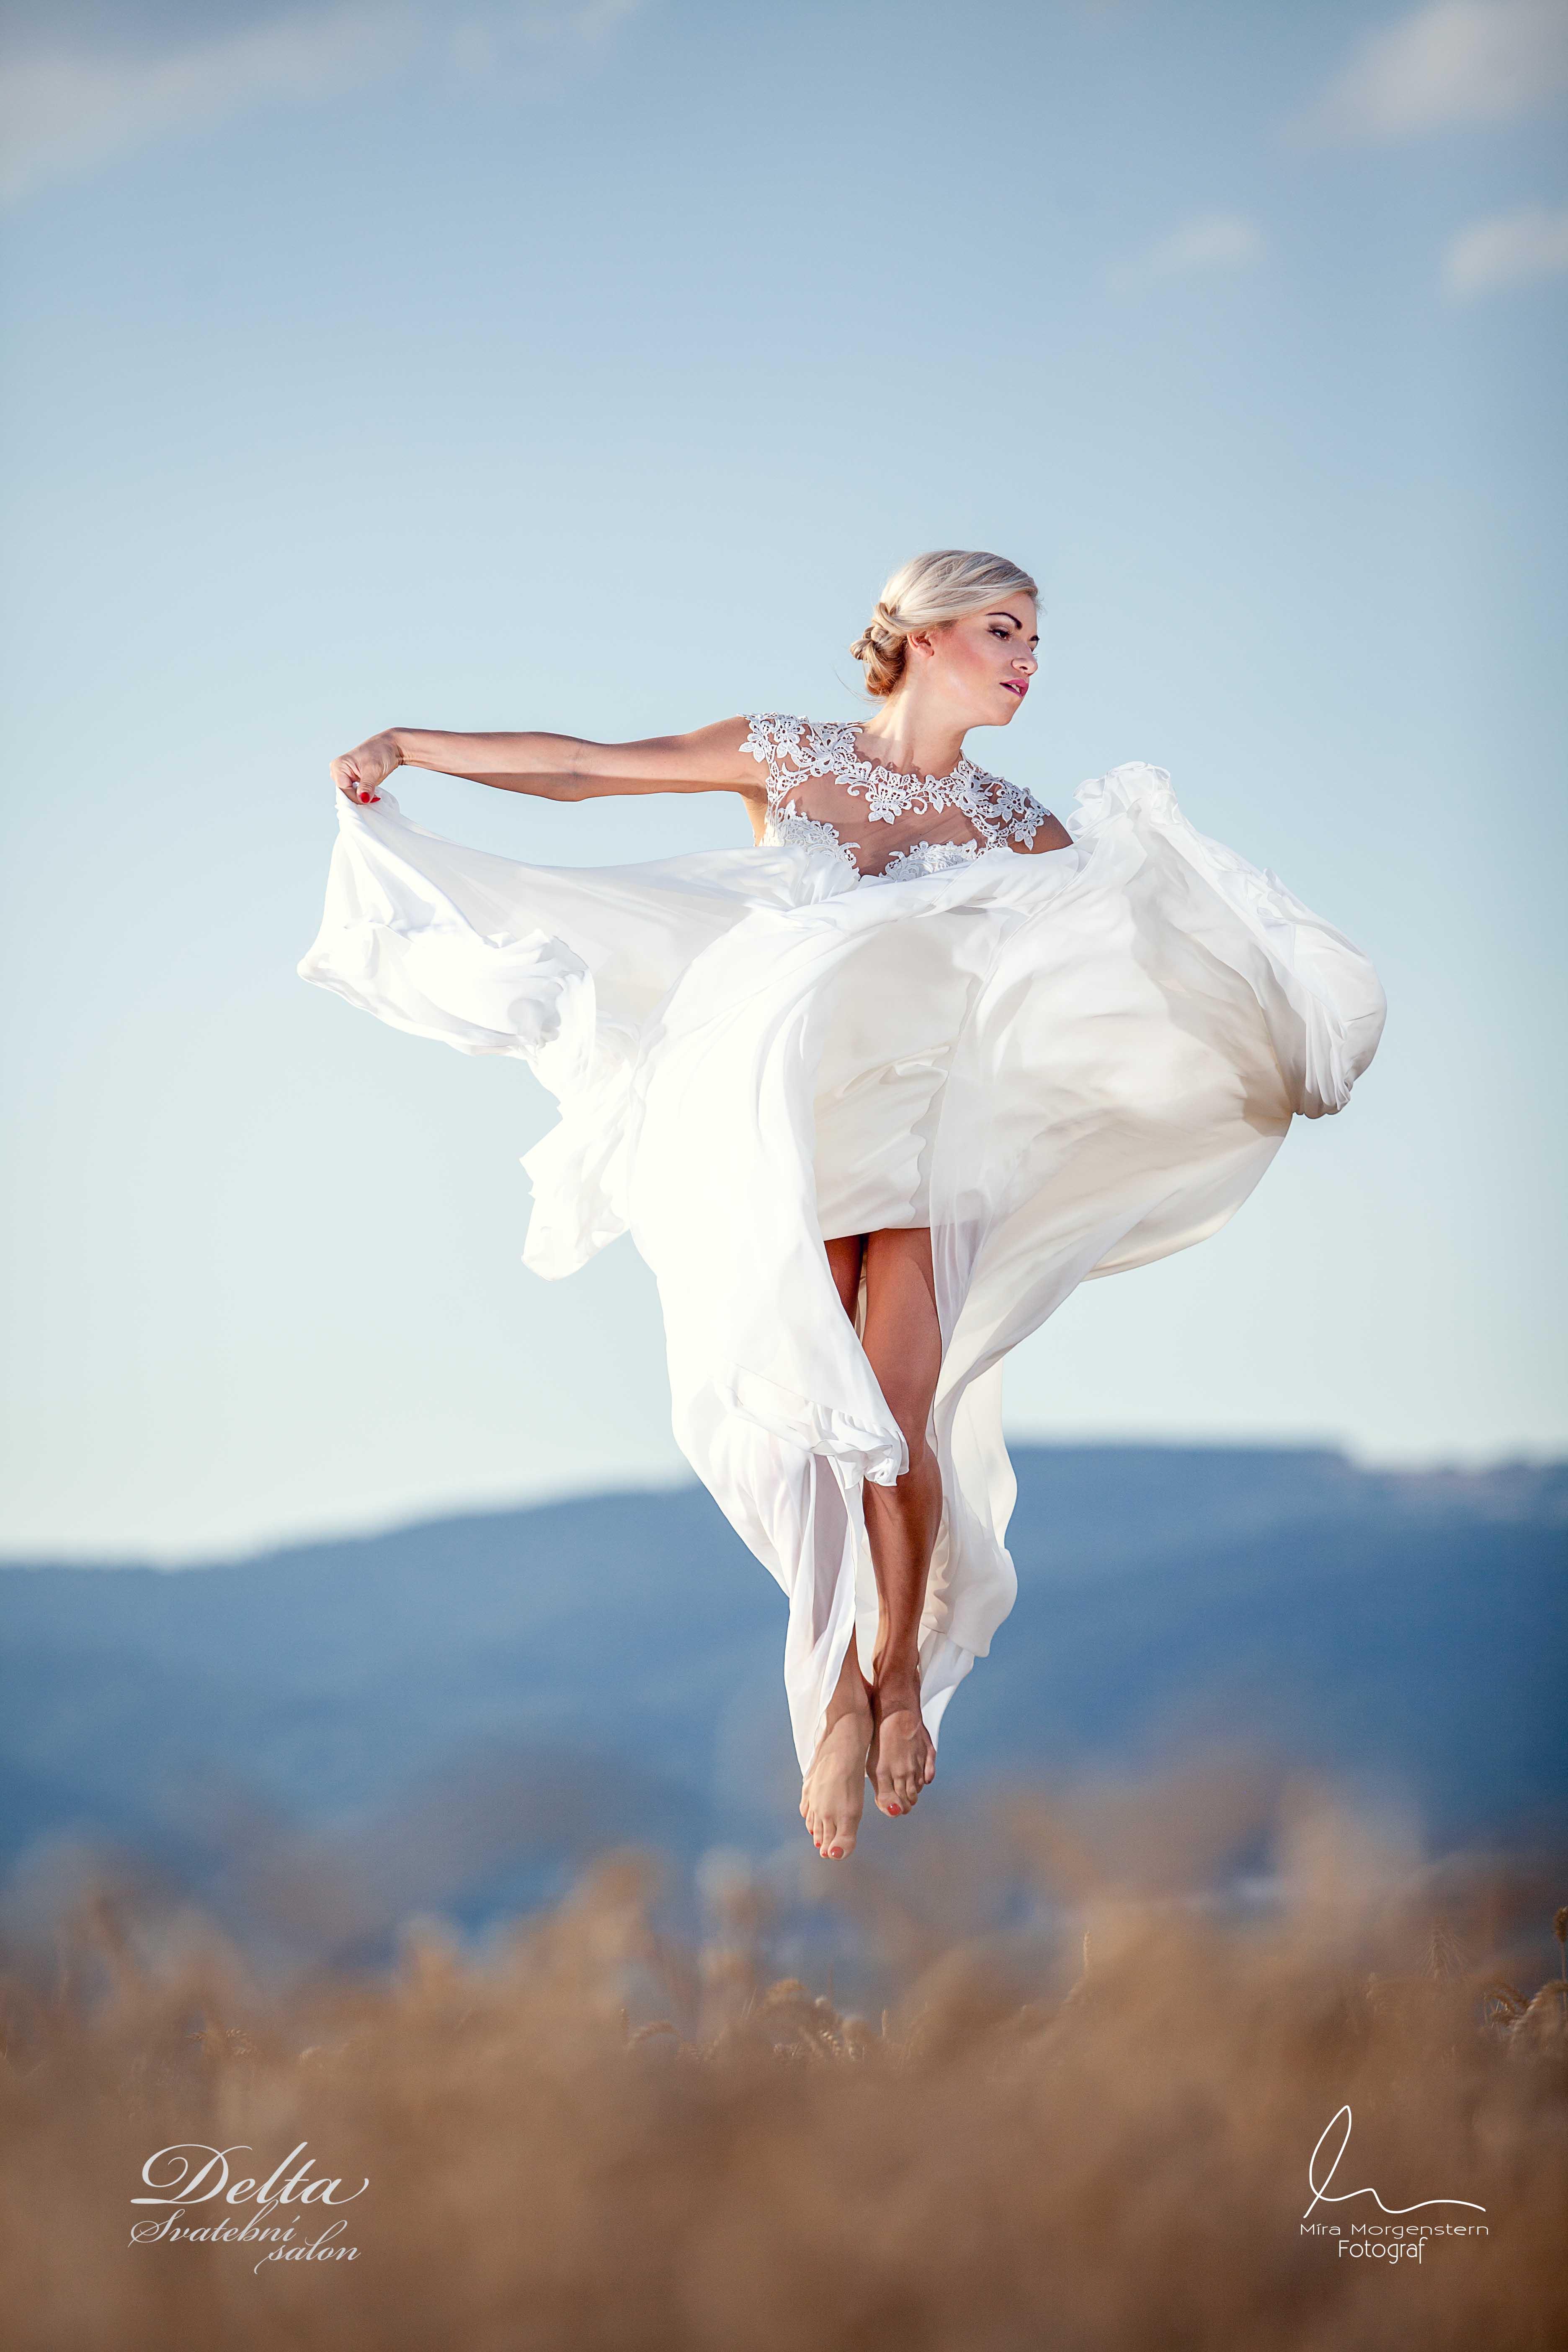 Fotograf Svatební fotograf, fotograf na svatbu fashion